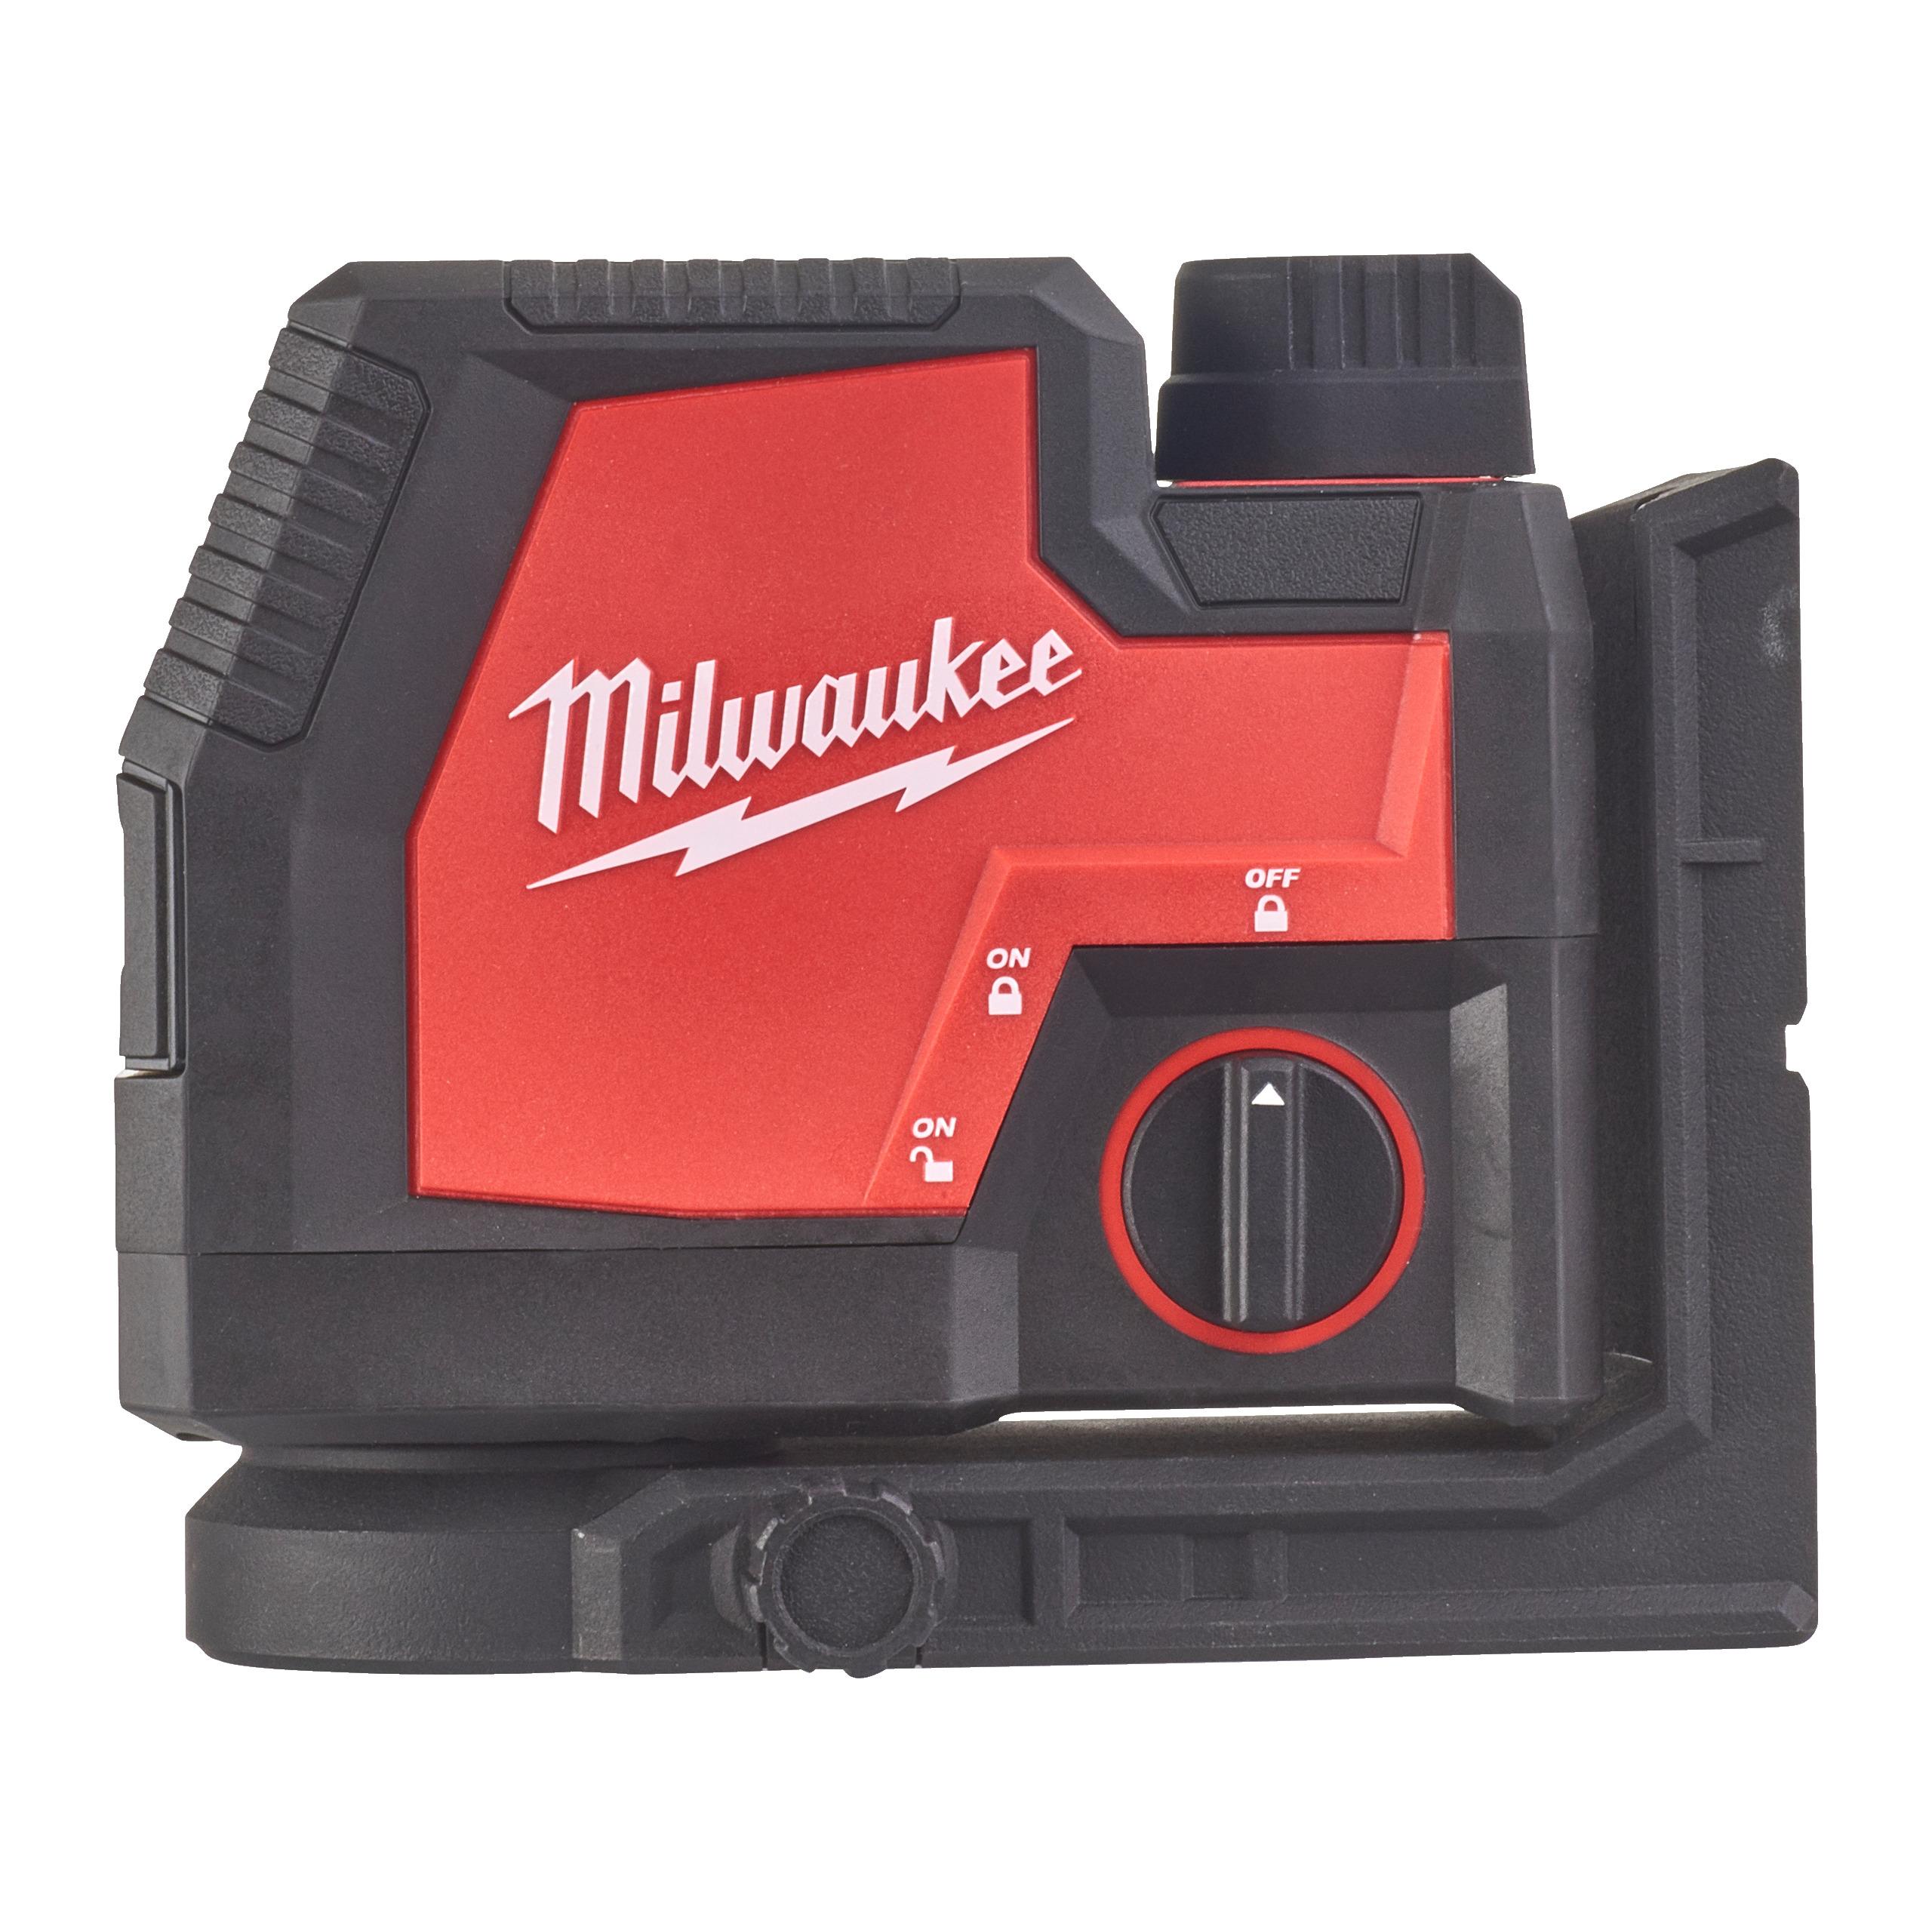 MILWAUKEE L4 CLLP-301C